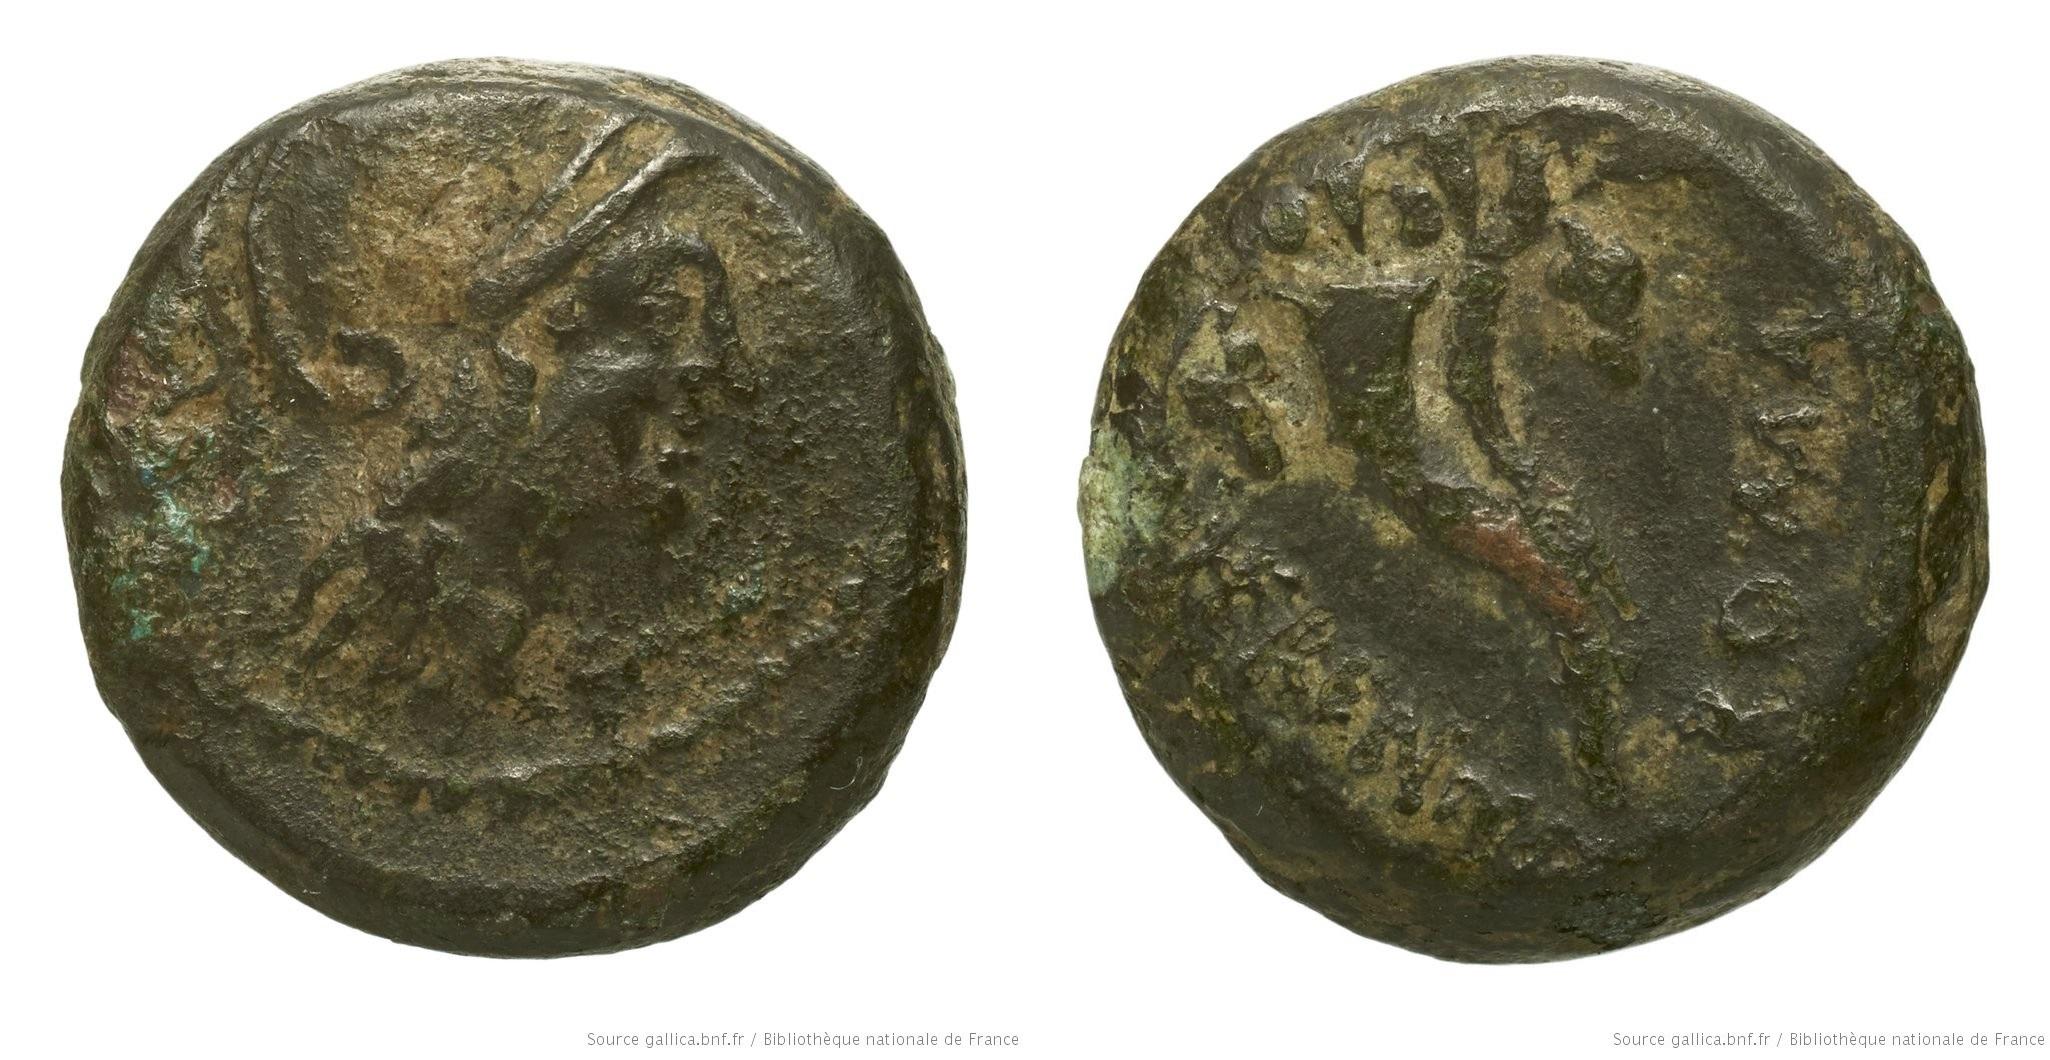 1128HE – Once Herennia – Marcus Herennius